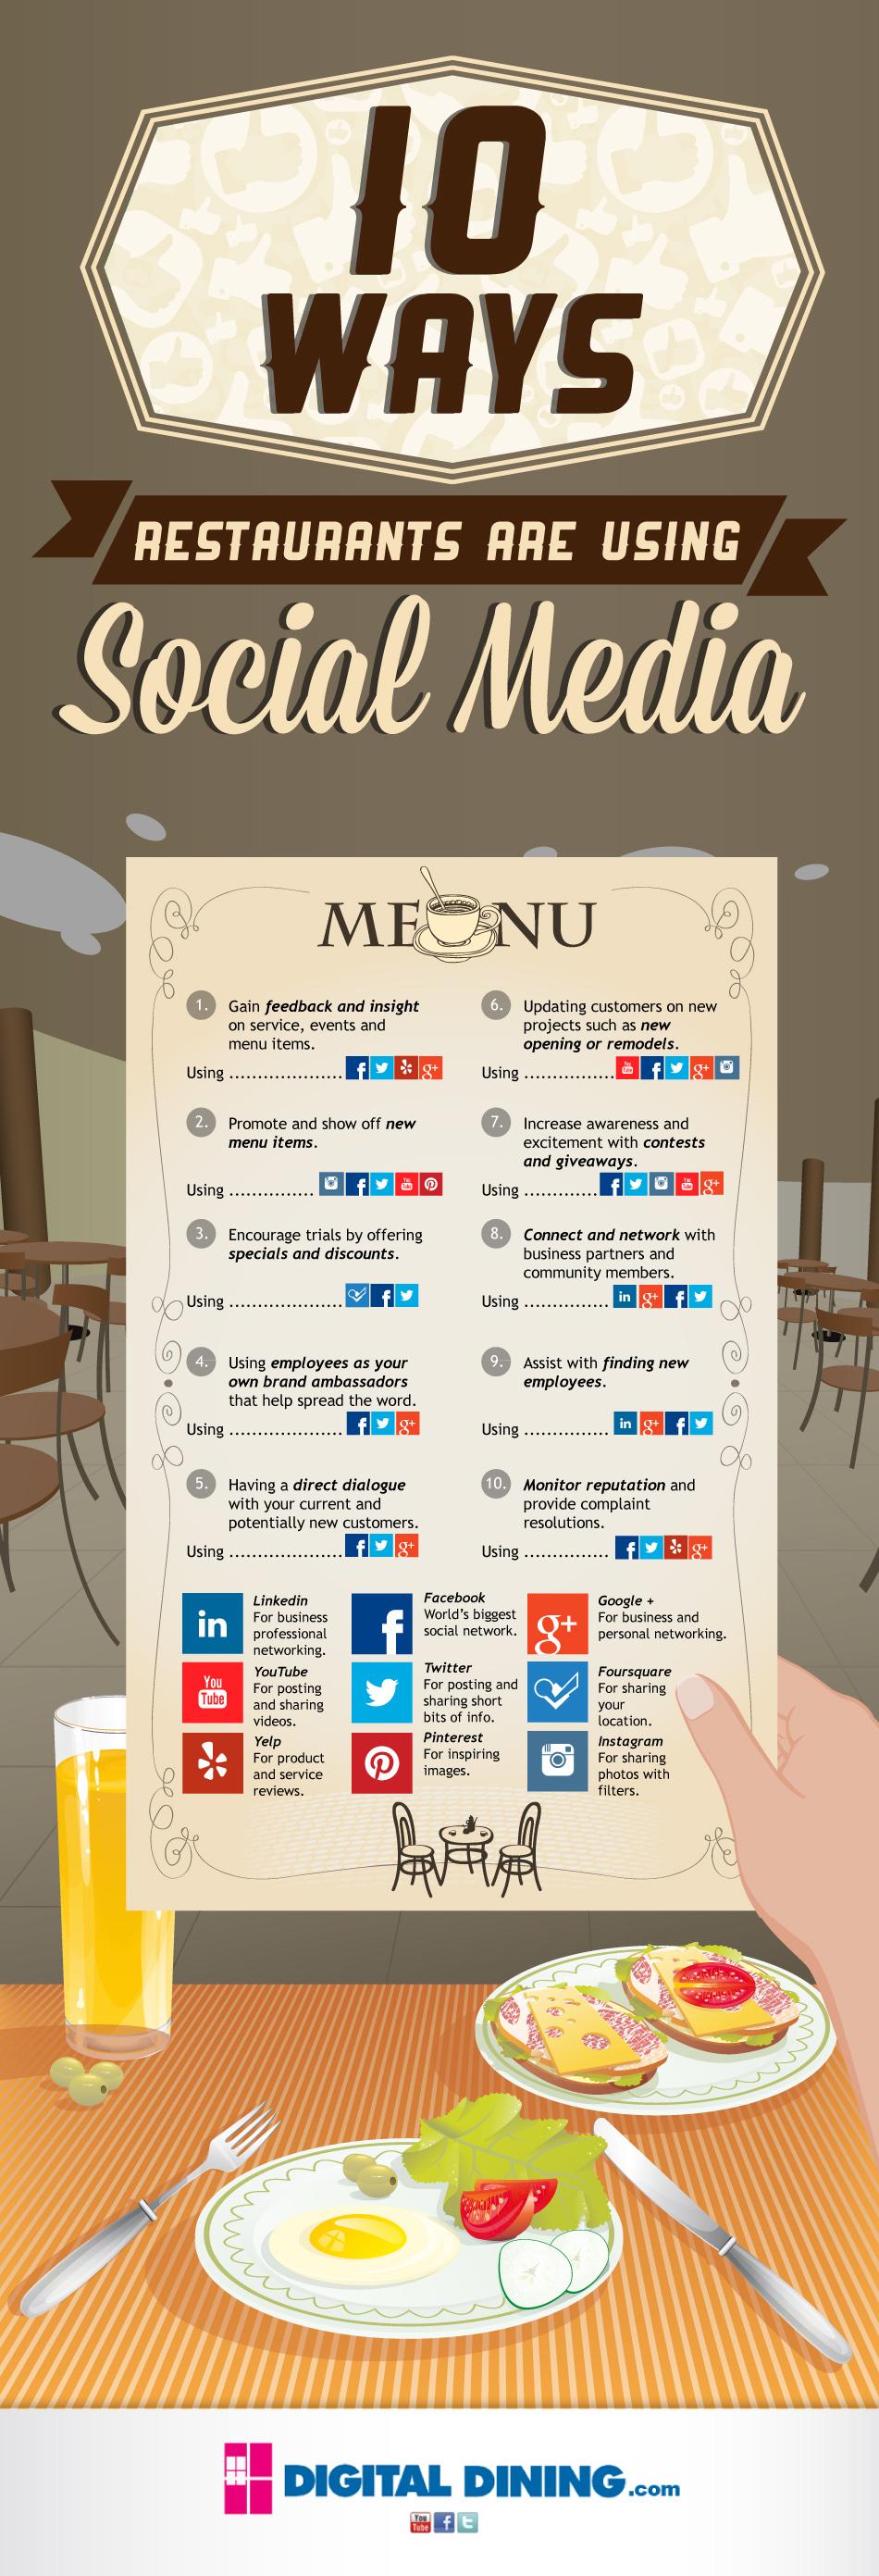 restoranlarin_sosyal_medya_kullanimi_infografik